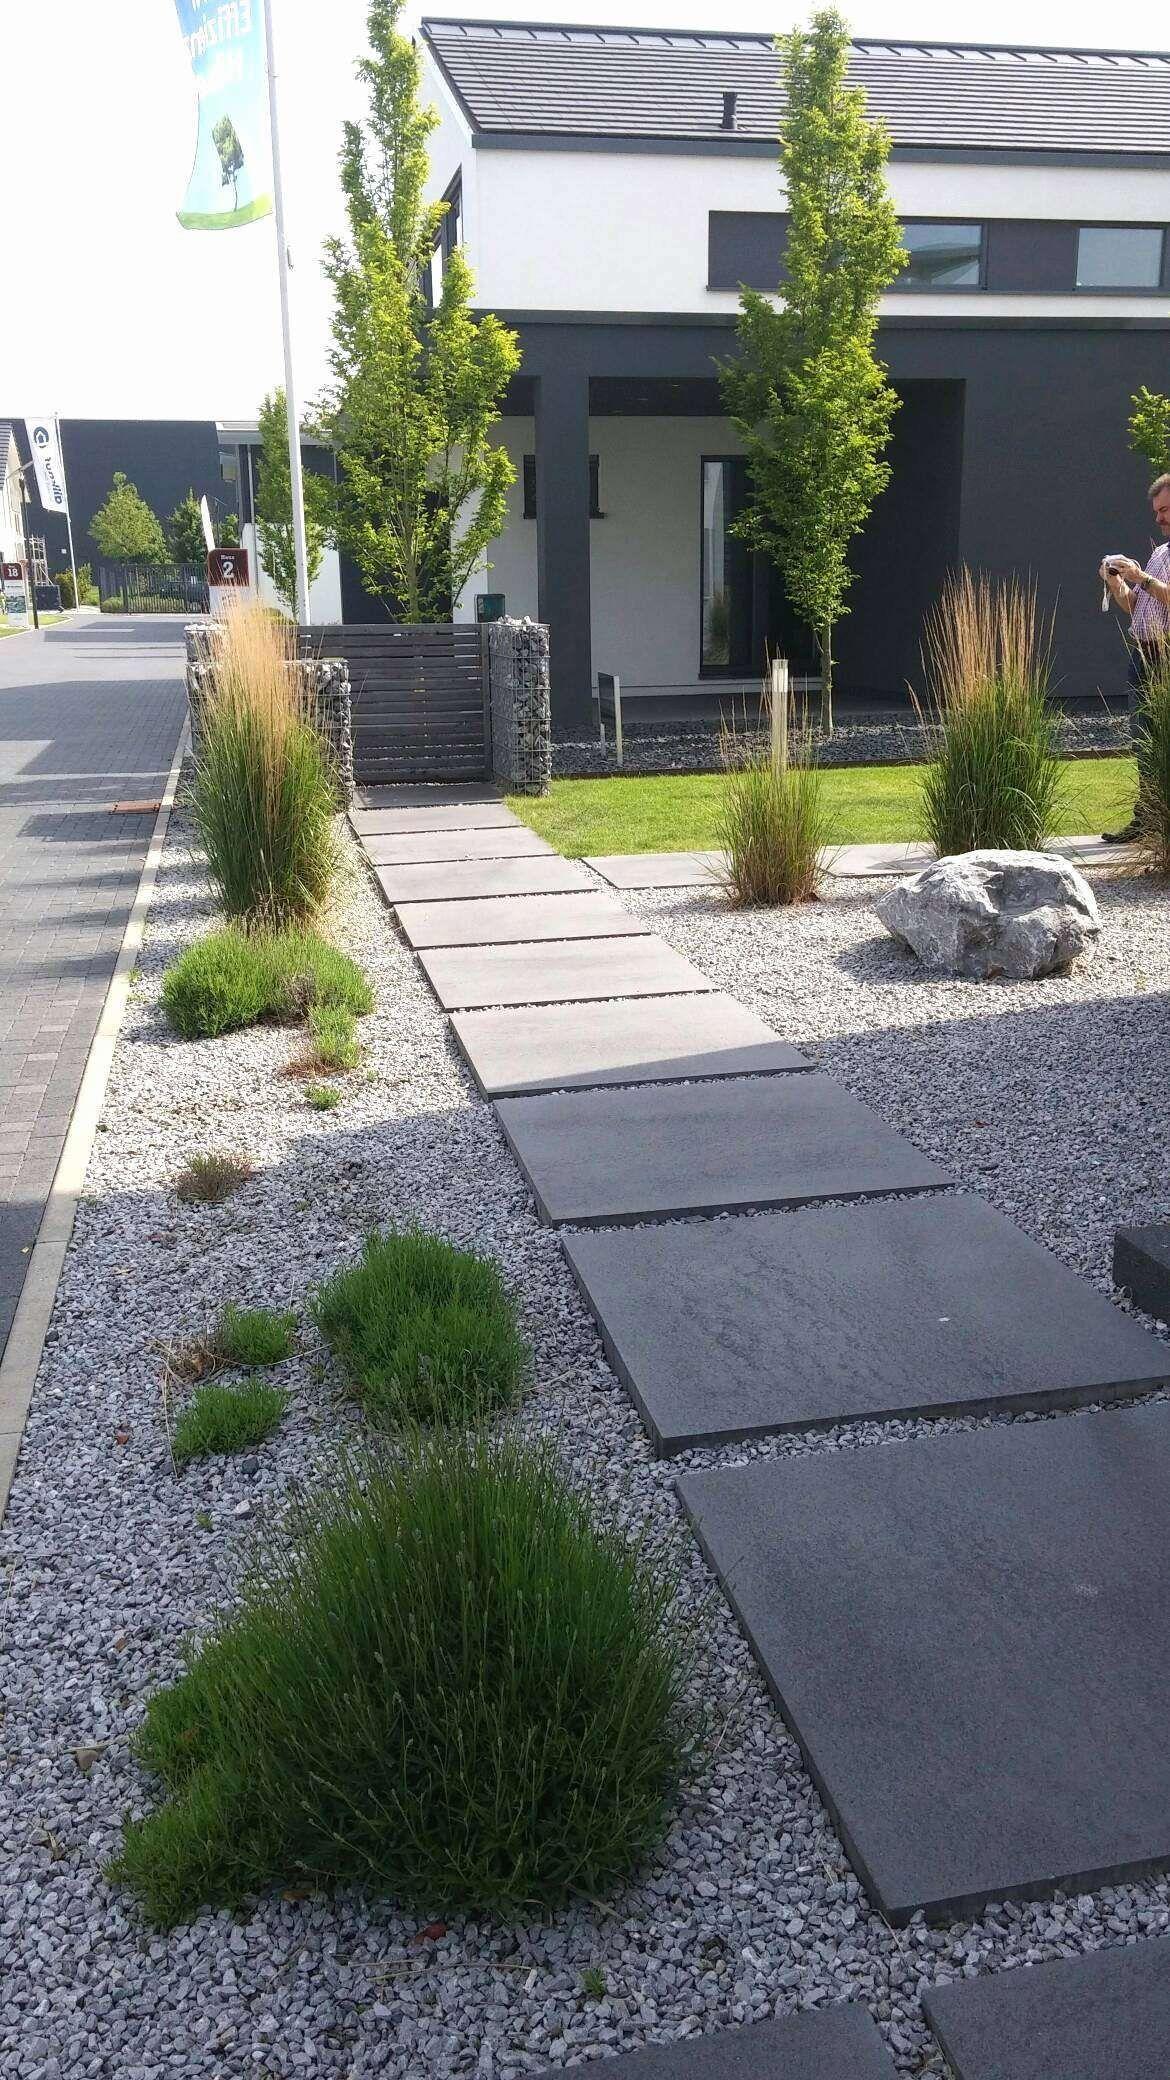 Moderne Gartengestaltung Beispiele Schön Garten Ideas Garten Anlegen Lovely Aussenleuchten Garten 0d